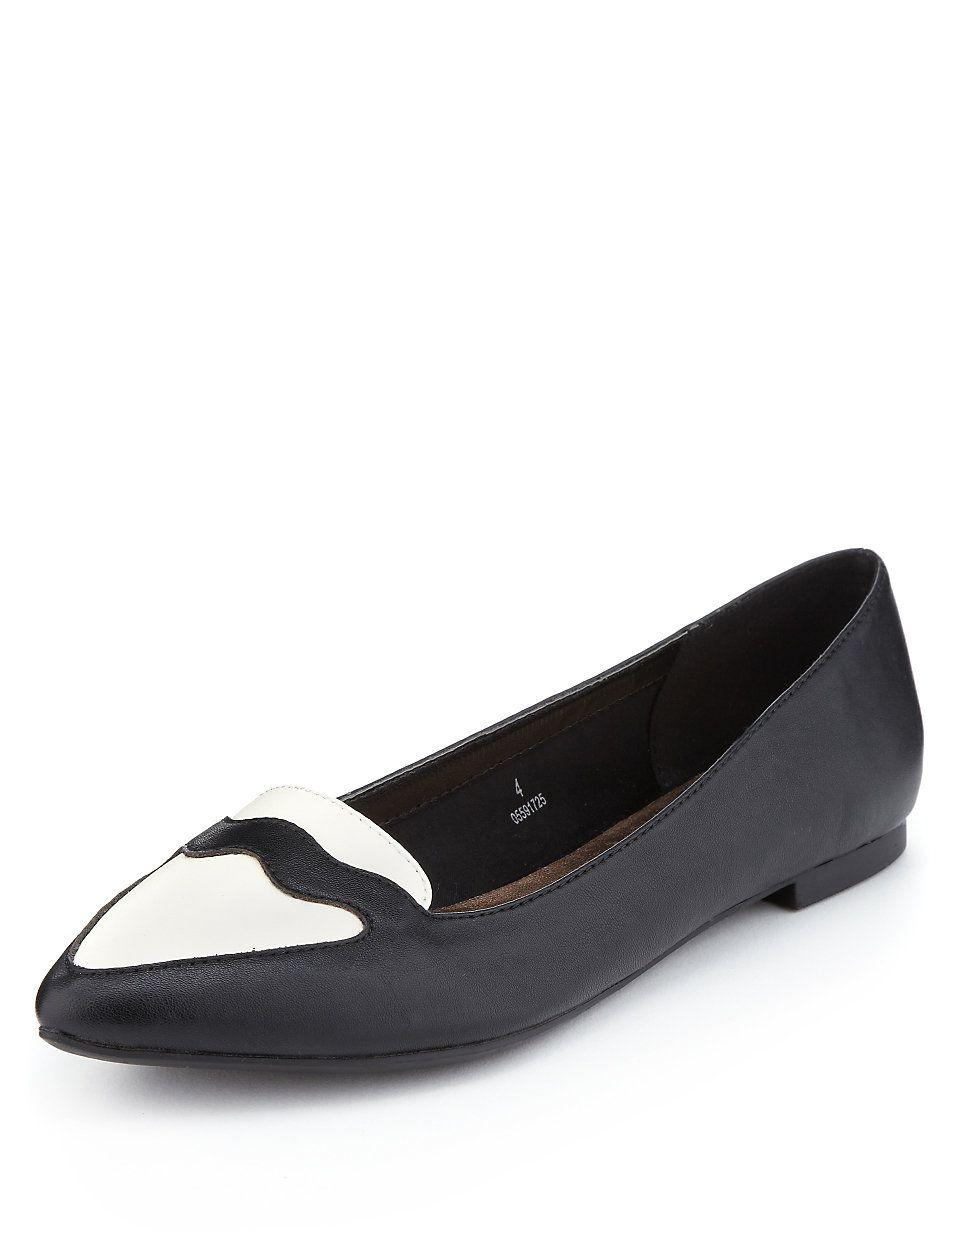 Contrast Pump Shoes with Insolia Flex